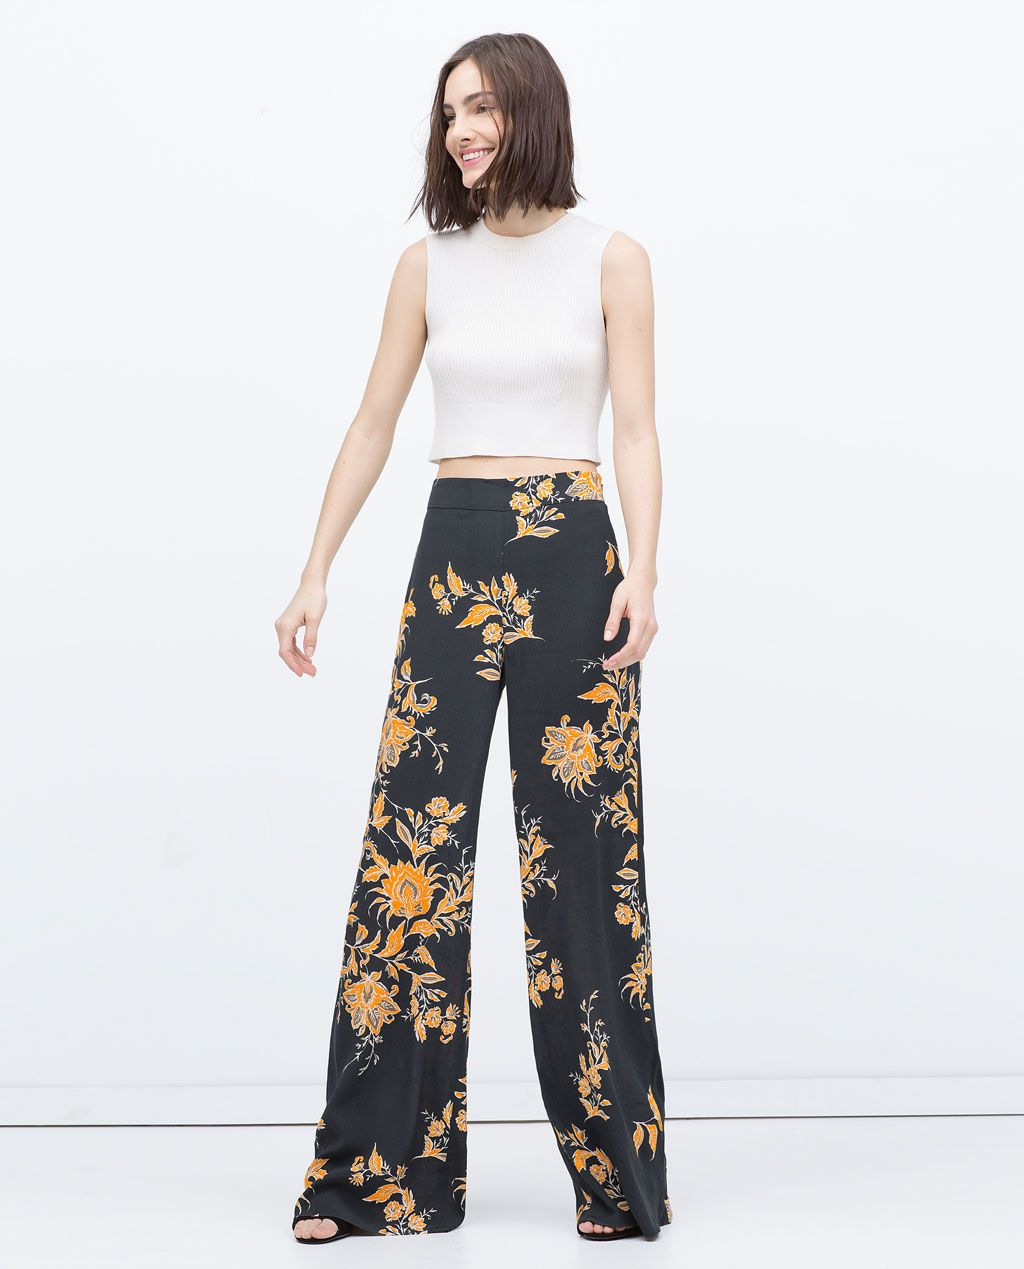 490990cdf9d39 Image 1 de PANTALON FLUIDE de Zara   CLOTHES